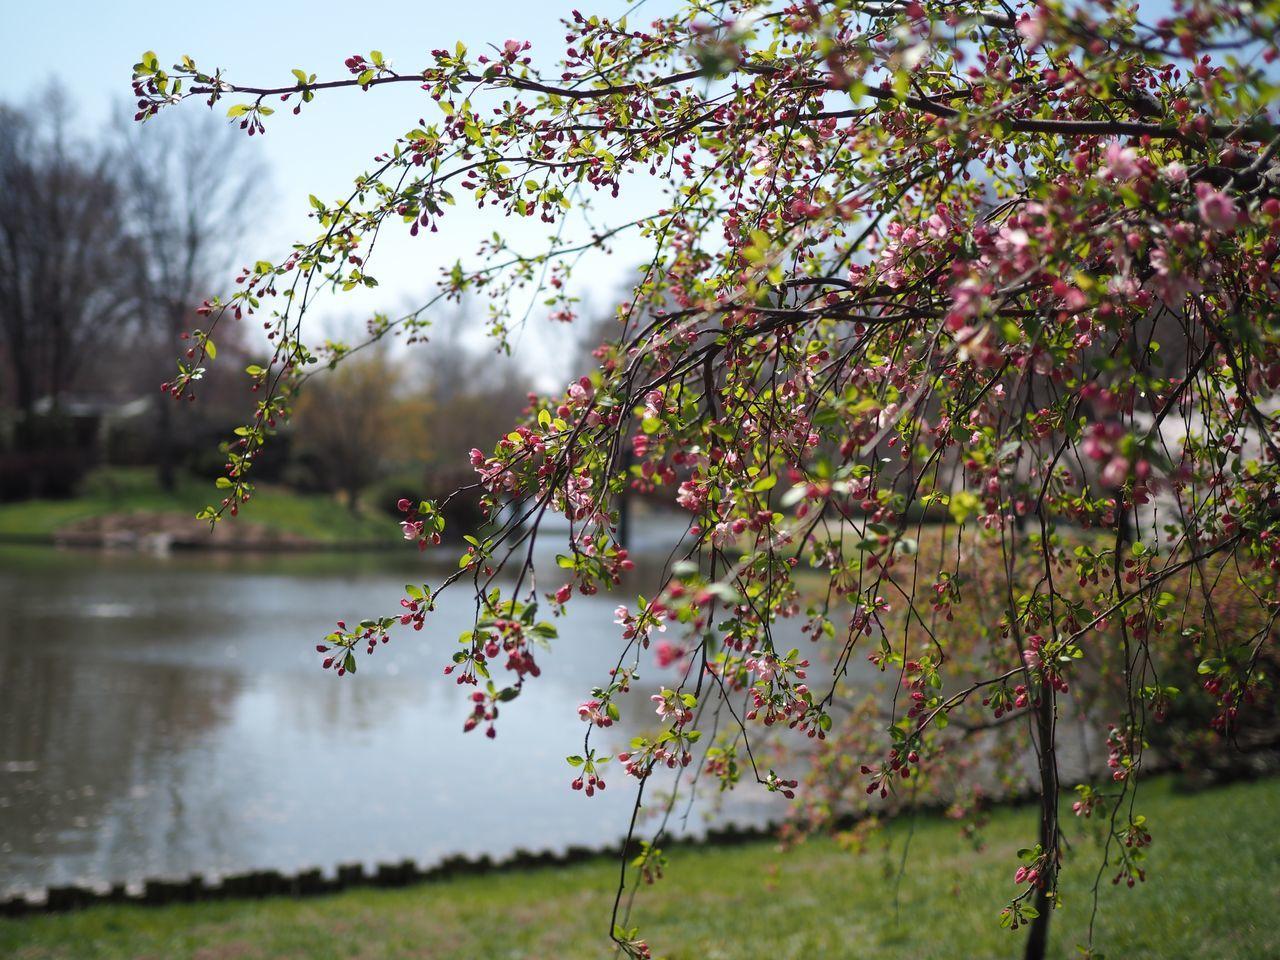 No Filter Nature Tree Spring Beauty In Nature Outdoors Springtime Missouri Botanical Garden Blossom MoBot Bud Pond Showcase April